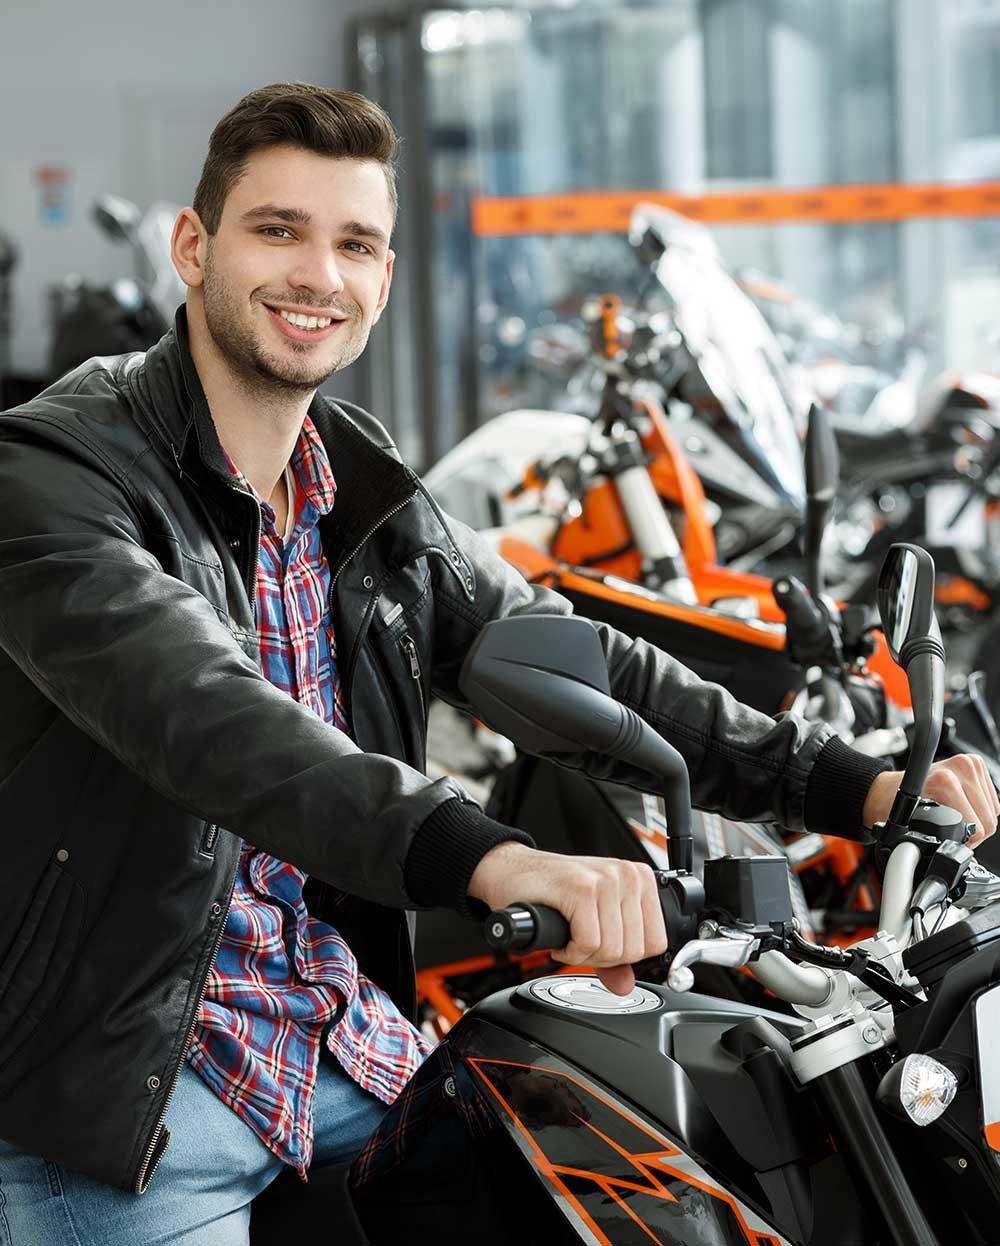 PrimeWay Motorcycle Loan Features